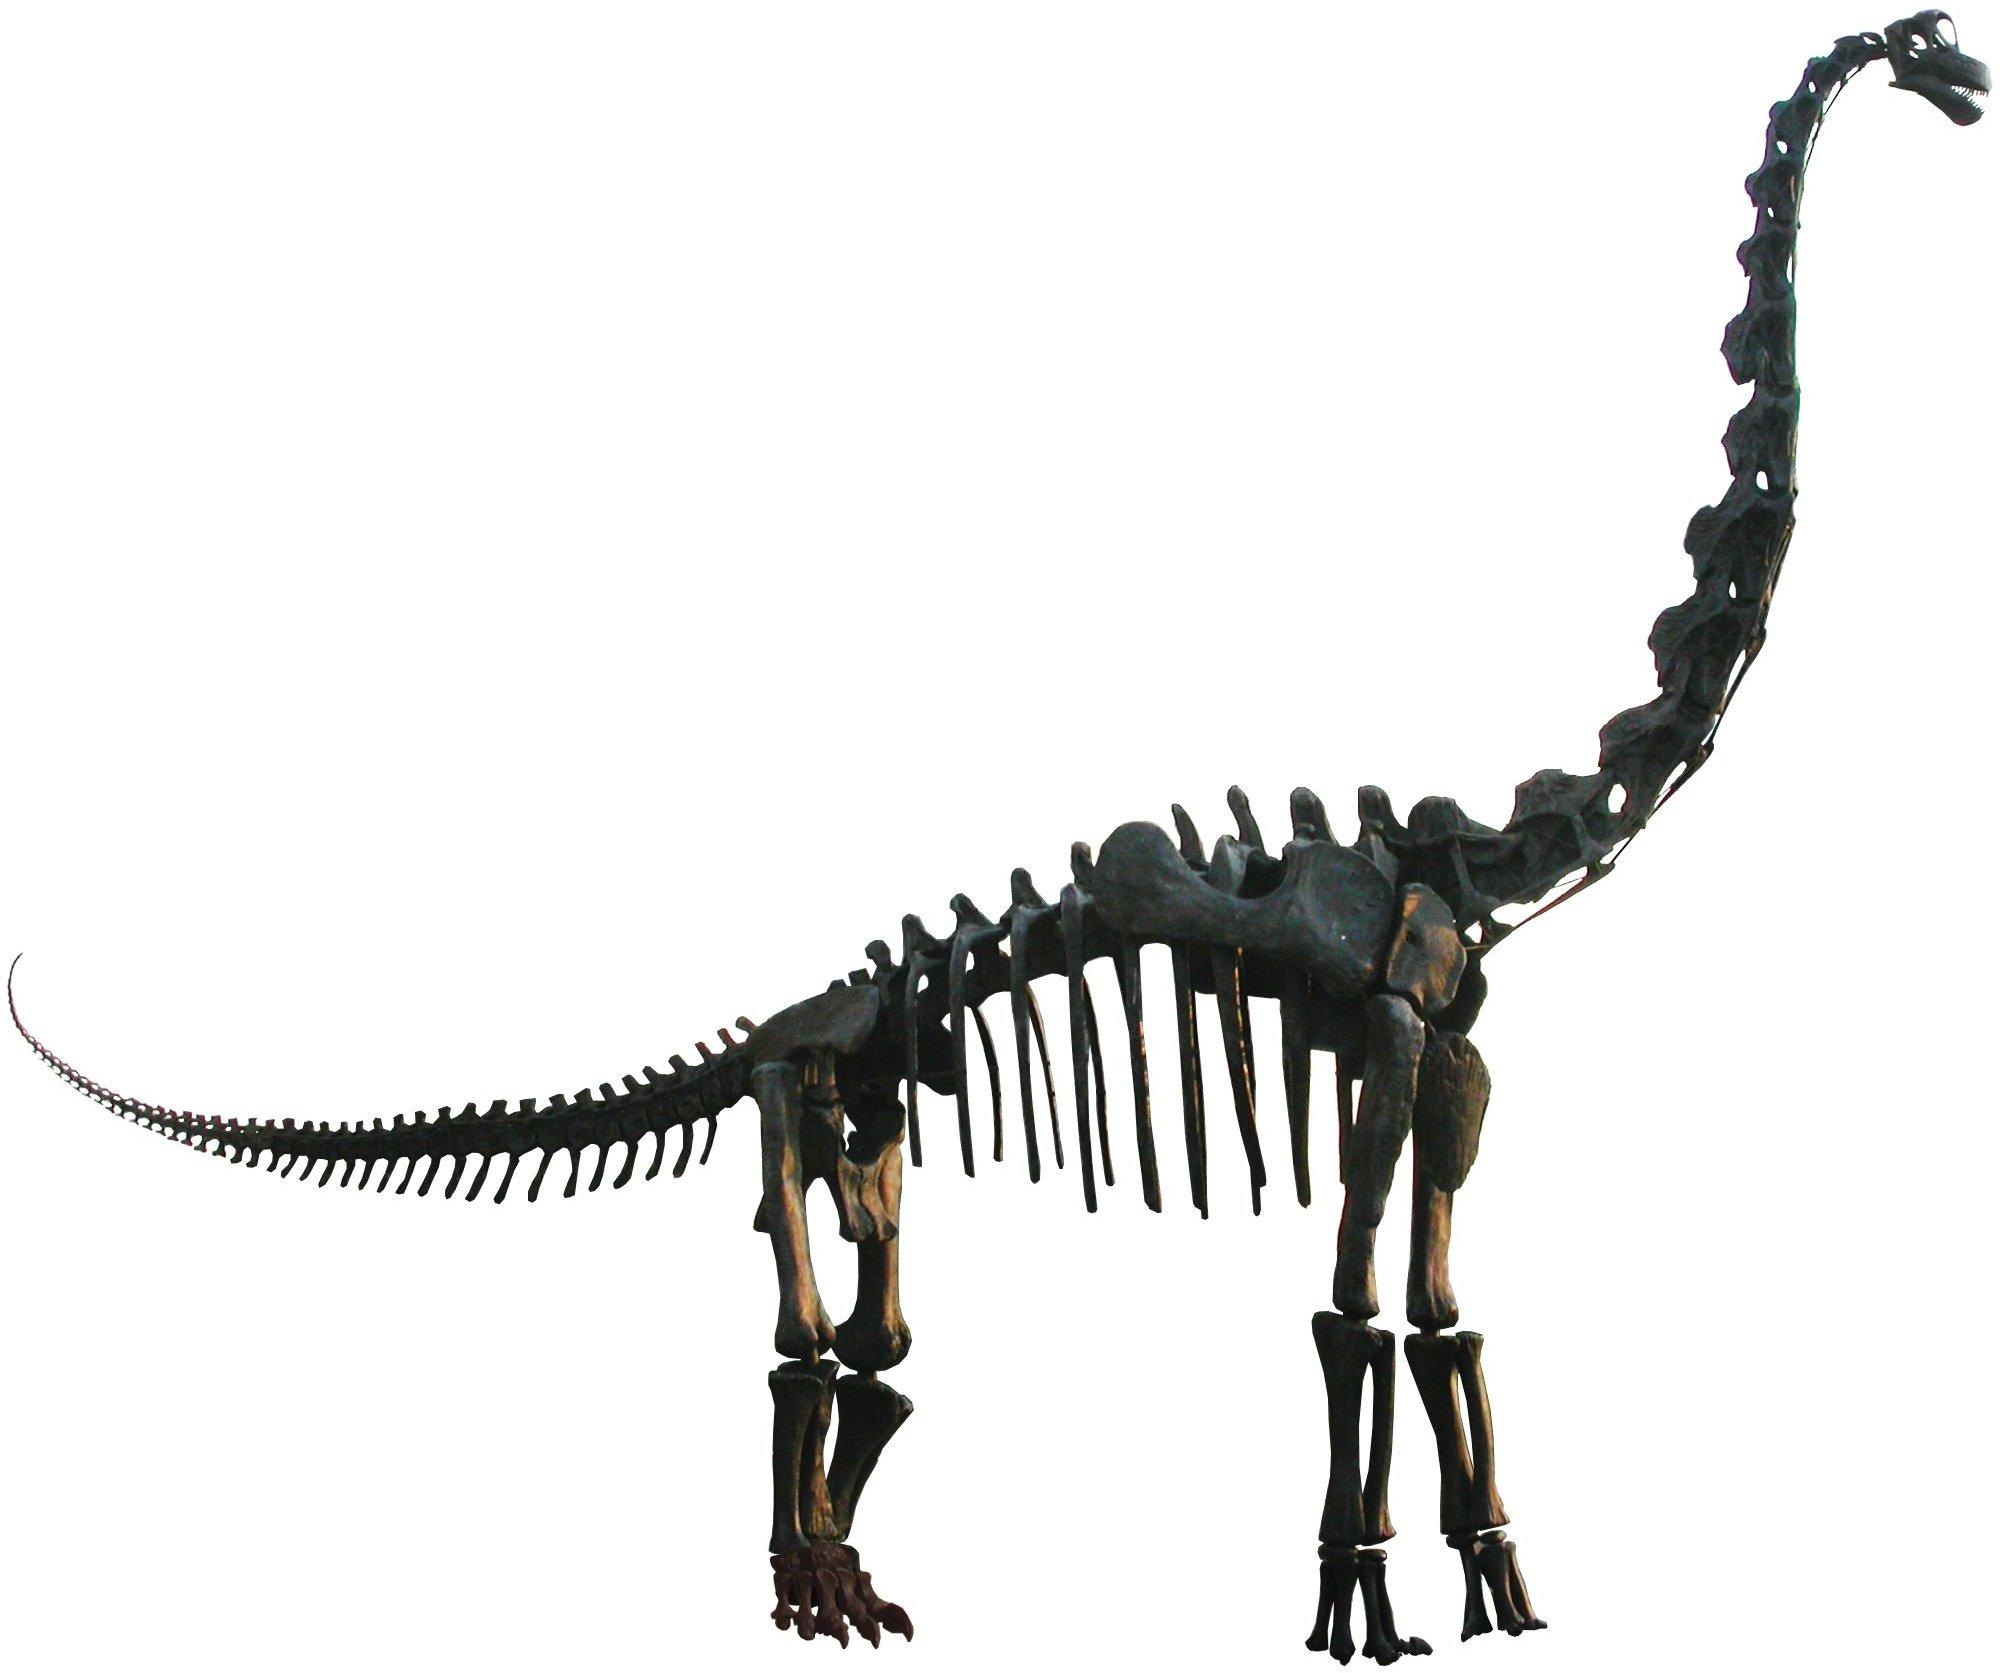 Sleleton clipart brachiosaurus Clipart Clipart Fossils dinosaur%20fossils Dinosaur